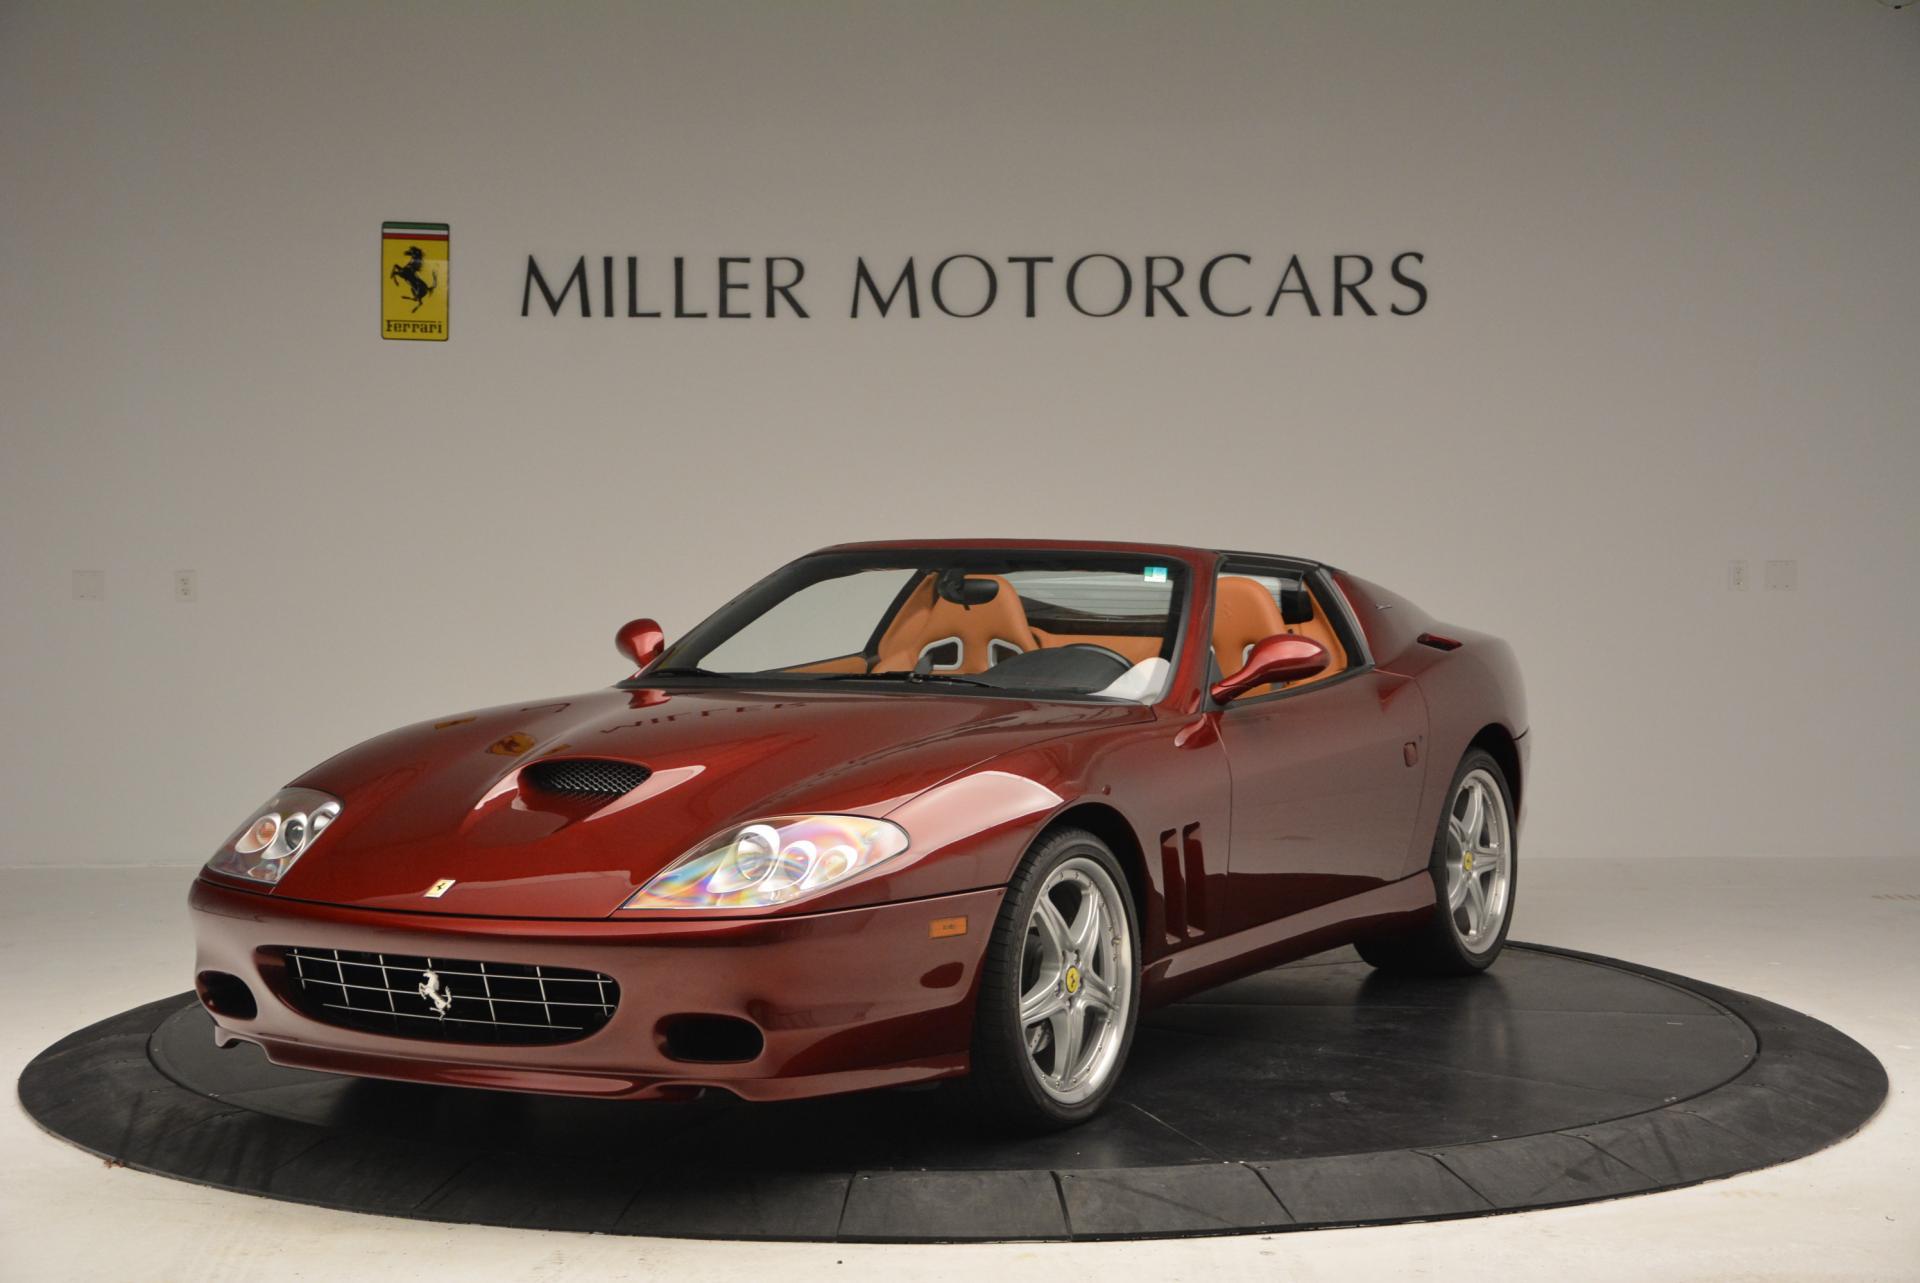 Used 2005 Ferrari Superamerica for sale Sold at Pagani of Greenwich in Greenwich CT 06830 1